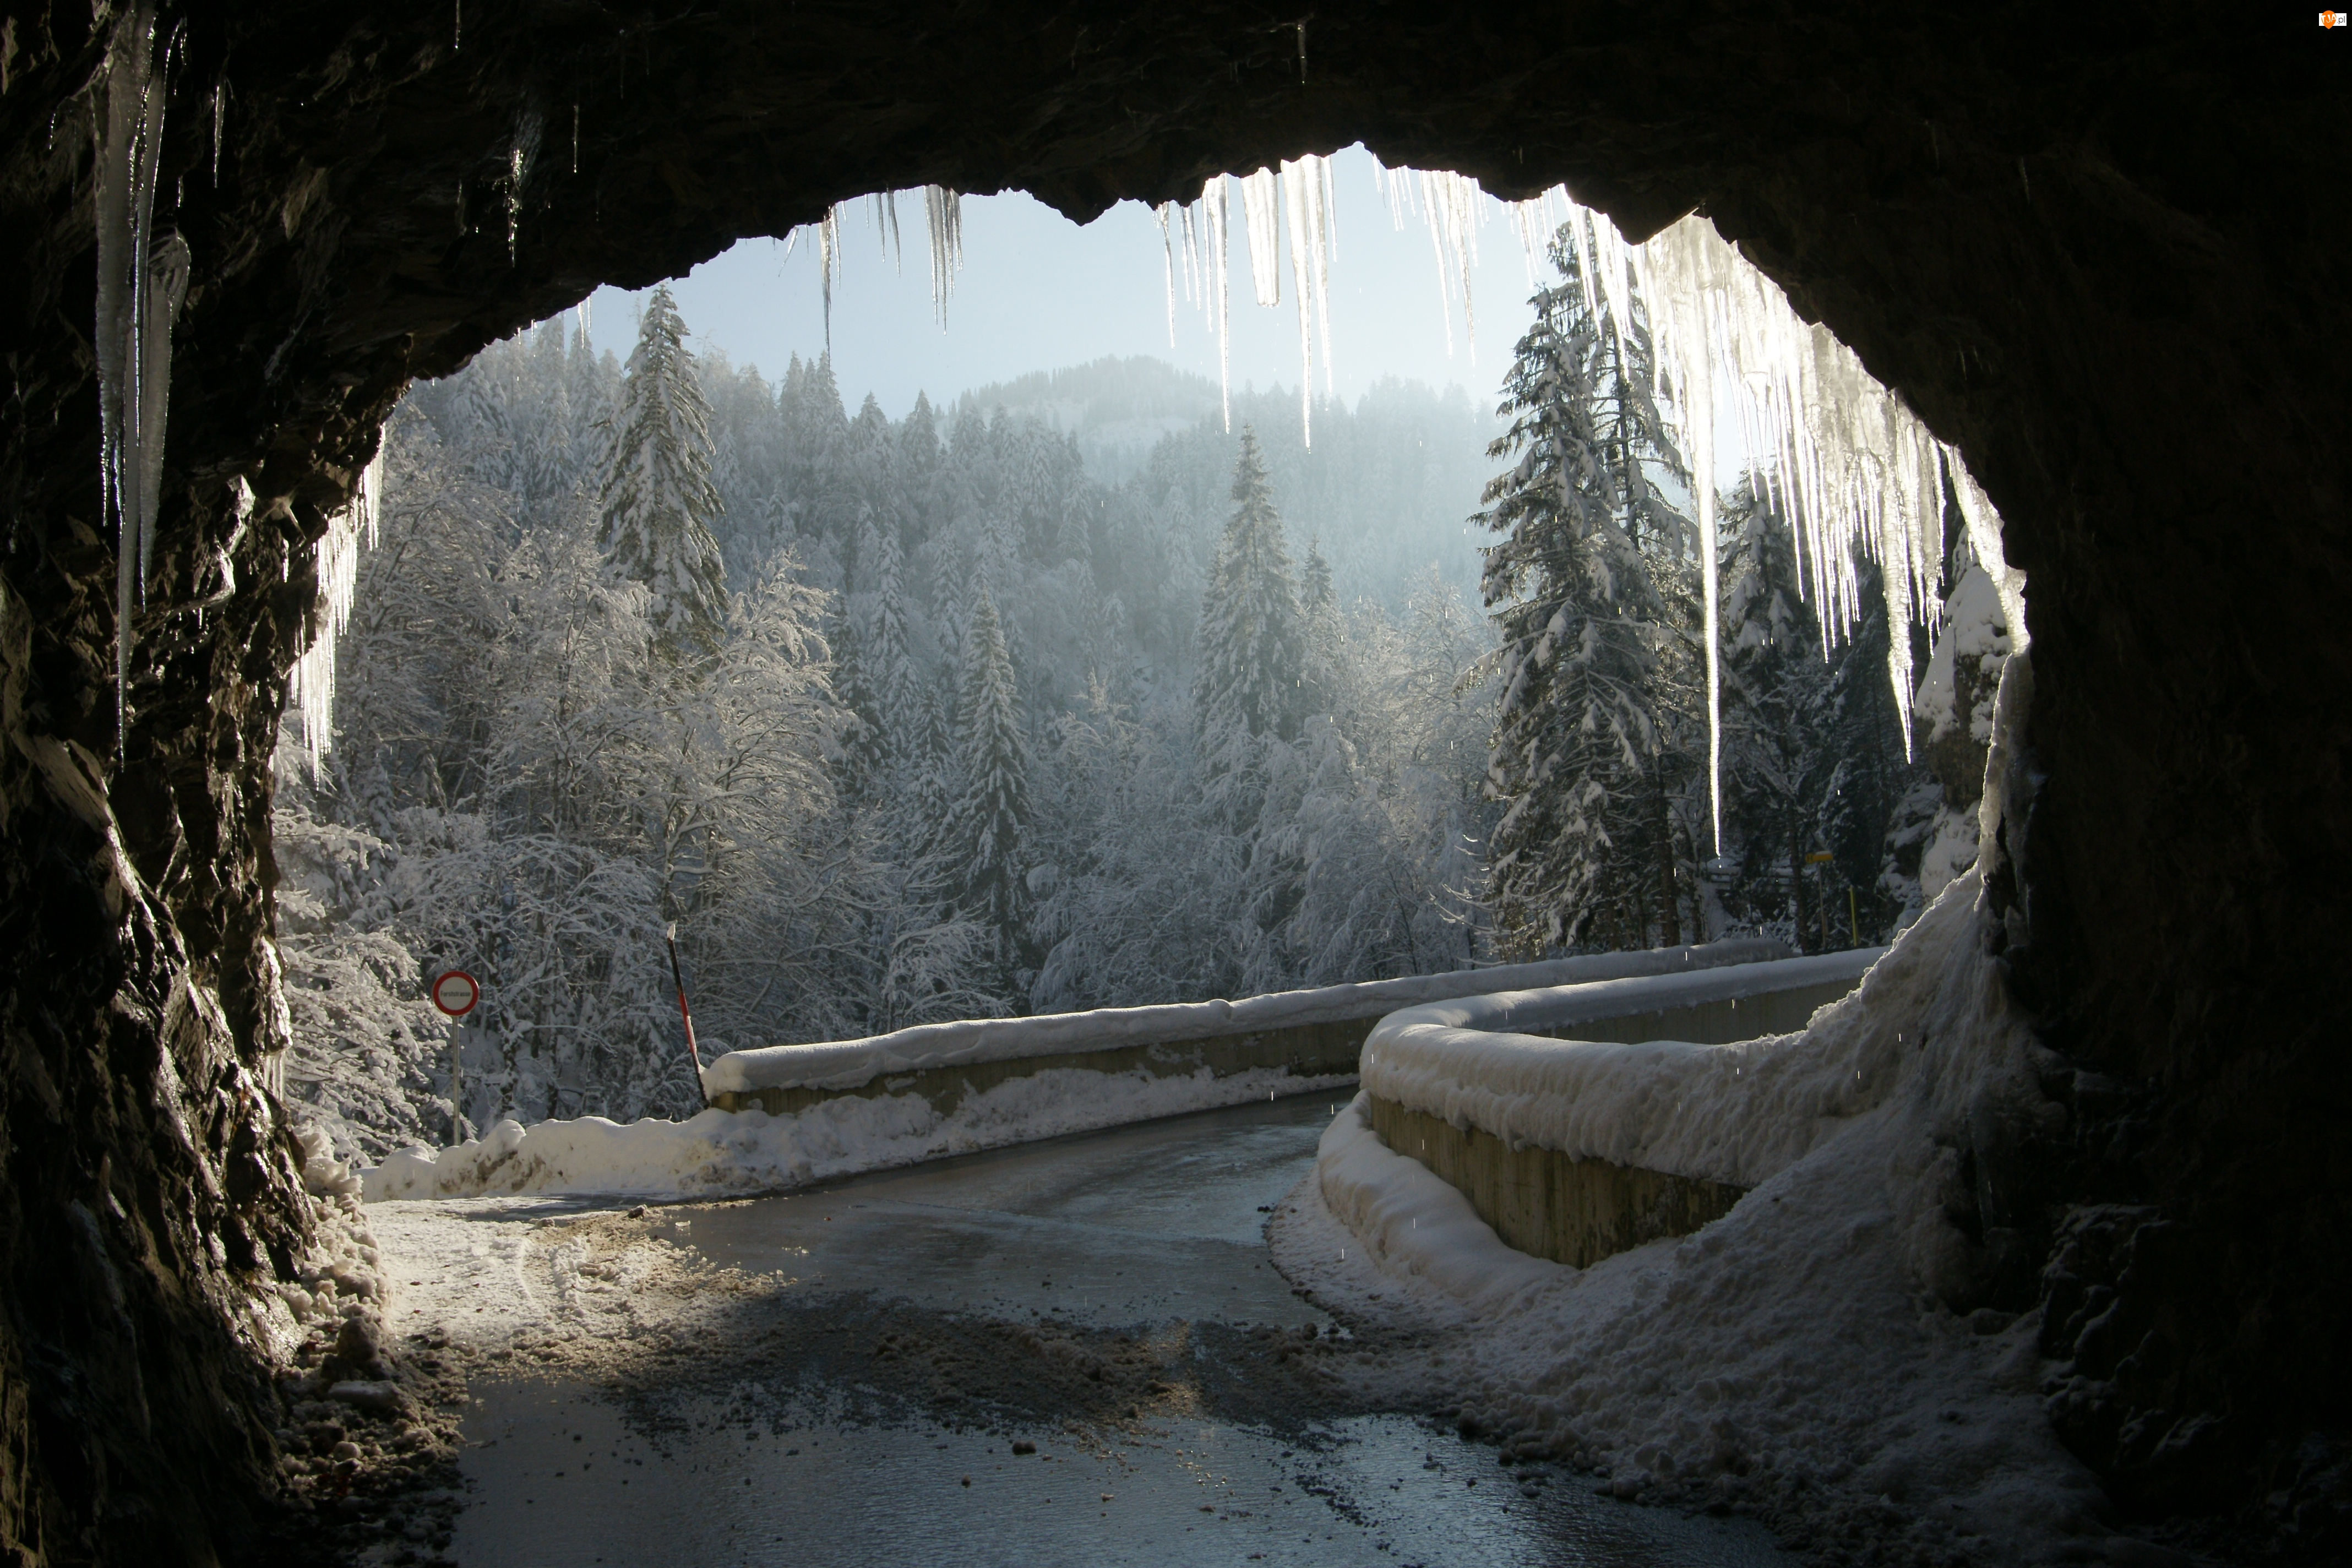 Zima, Sople, Droga, Tunel